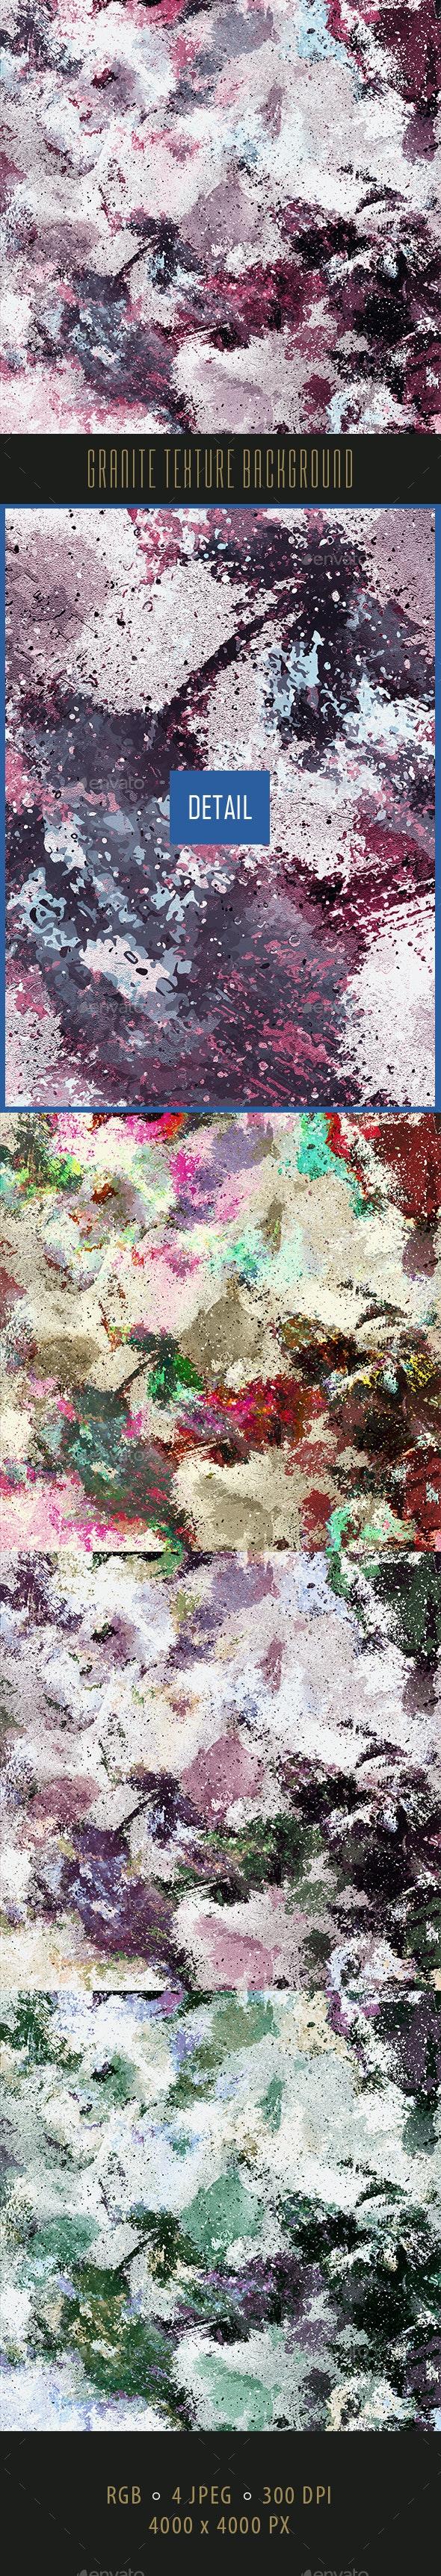 Granite Texture Background - Concrete Textures